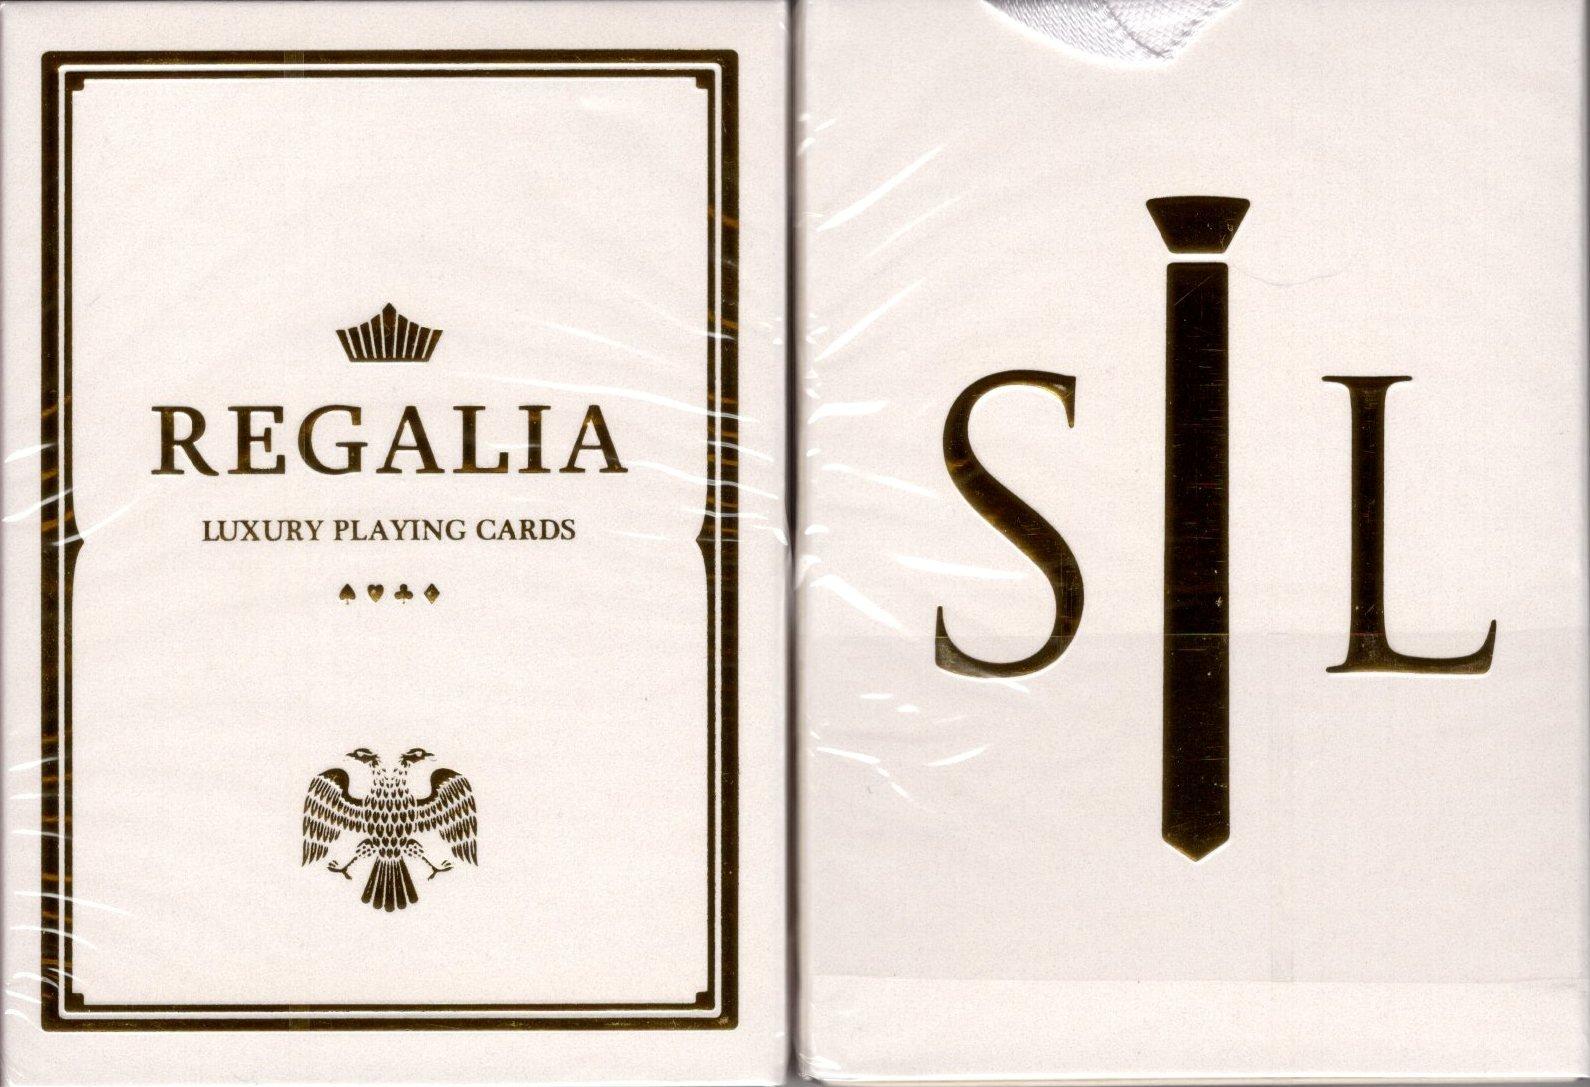 Regalia White Gold Luxury Playing Cards Poker Size Deck Shin Lim Cartamundi